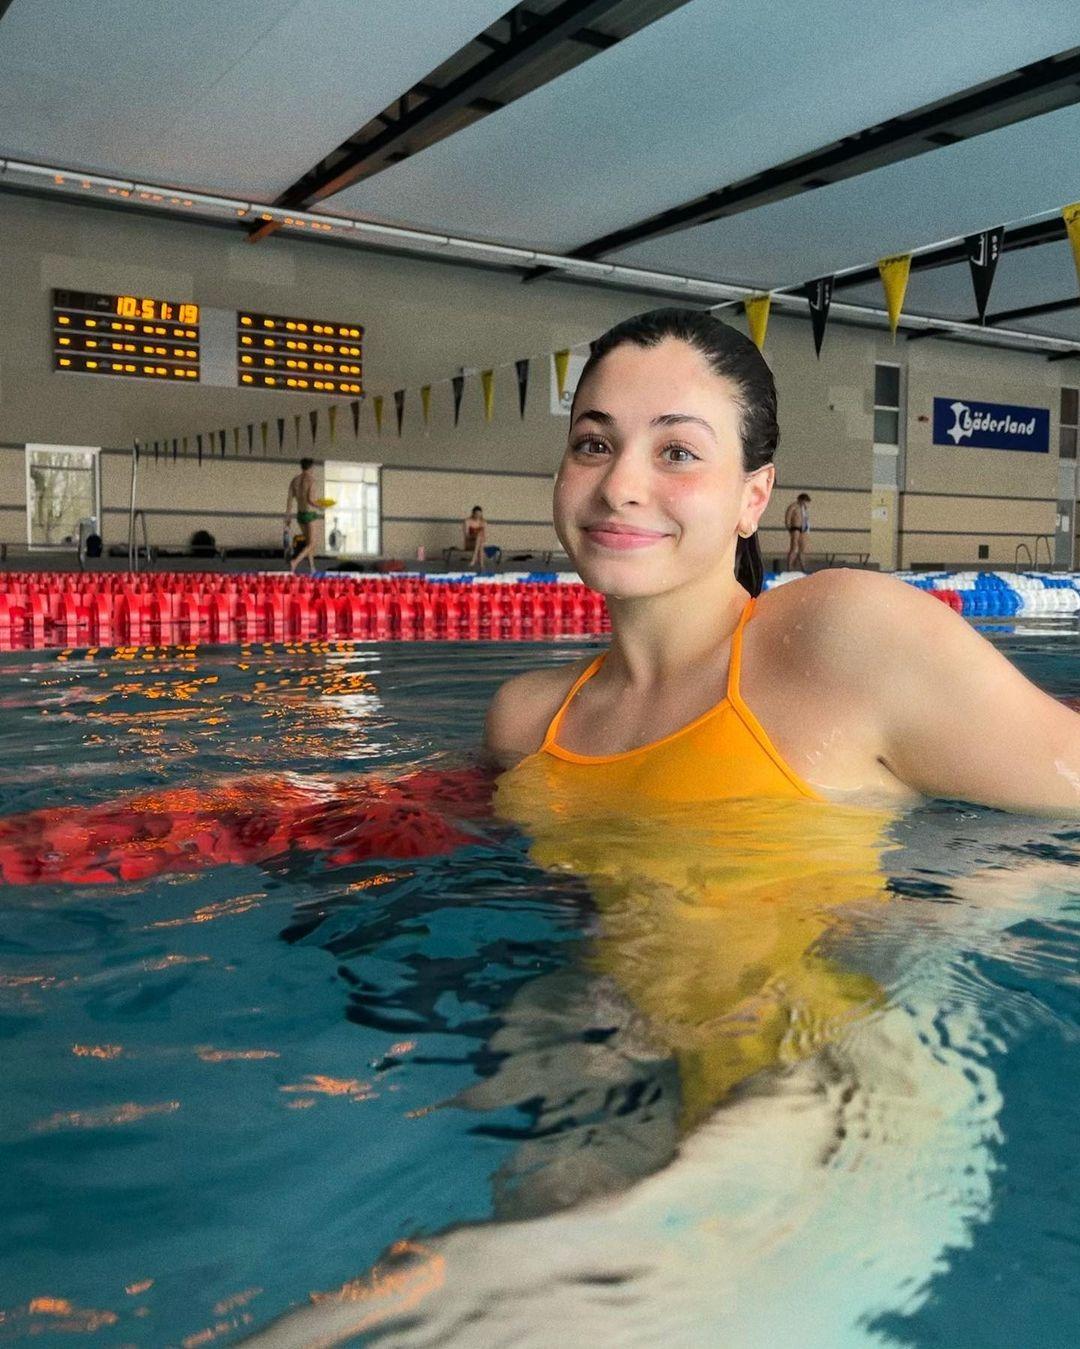 Yusra Mardini nadadora olímpica salvó a refugiados de morir